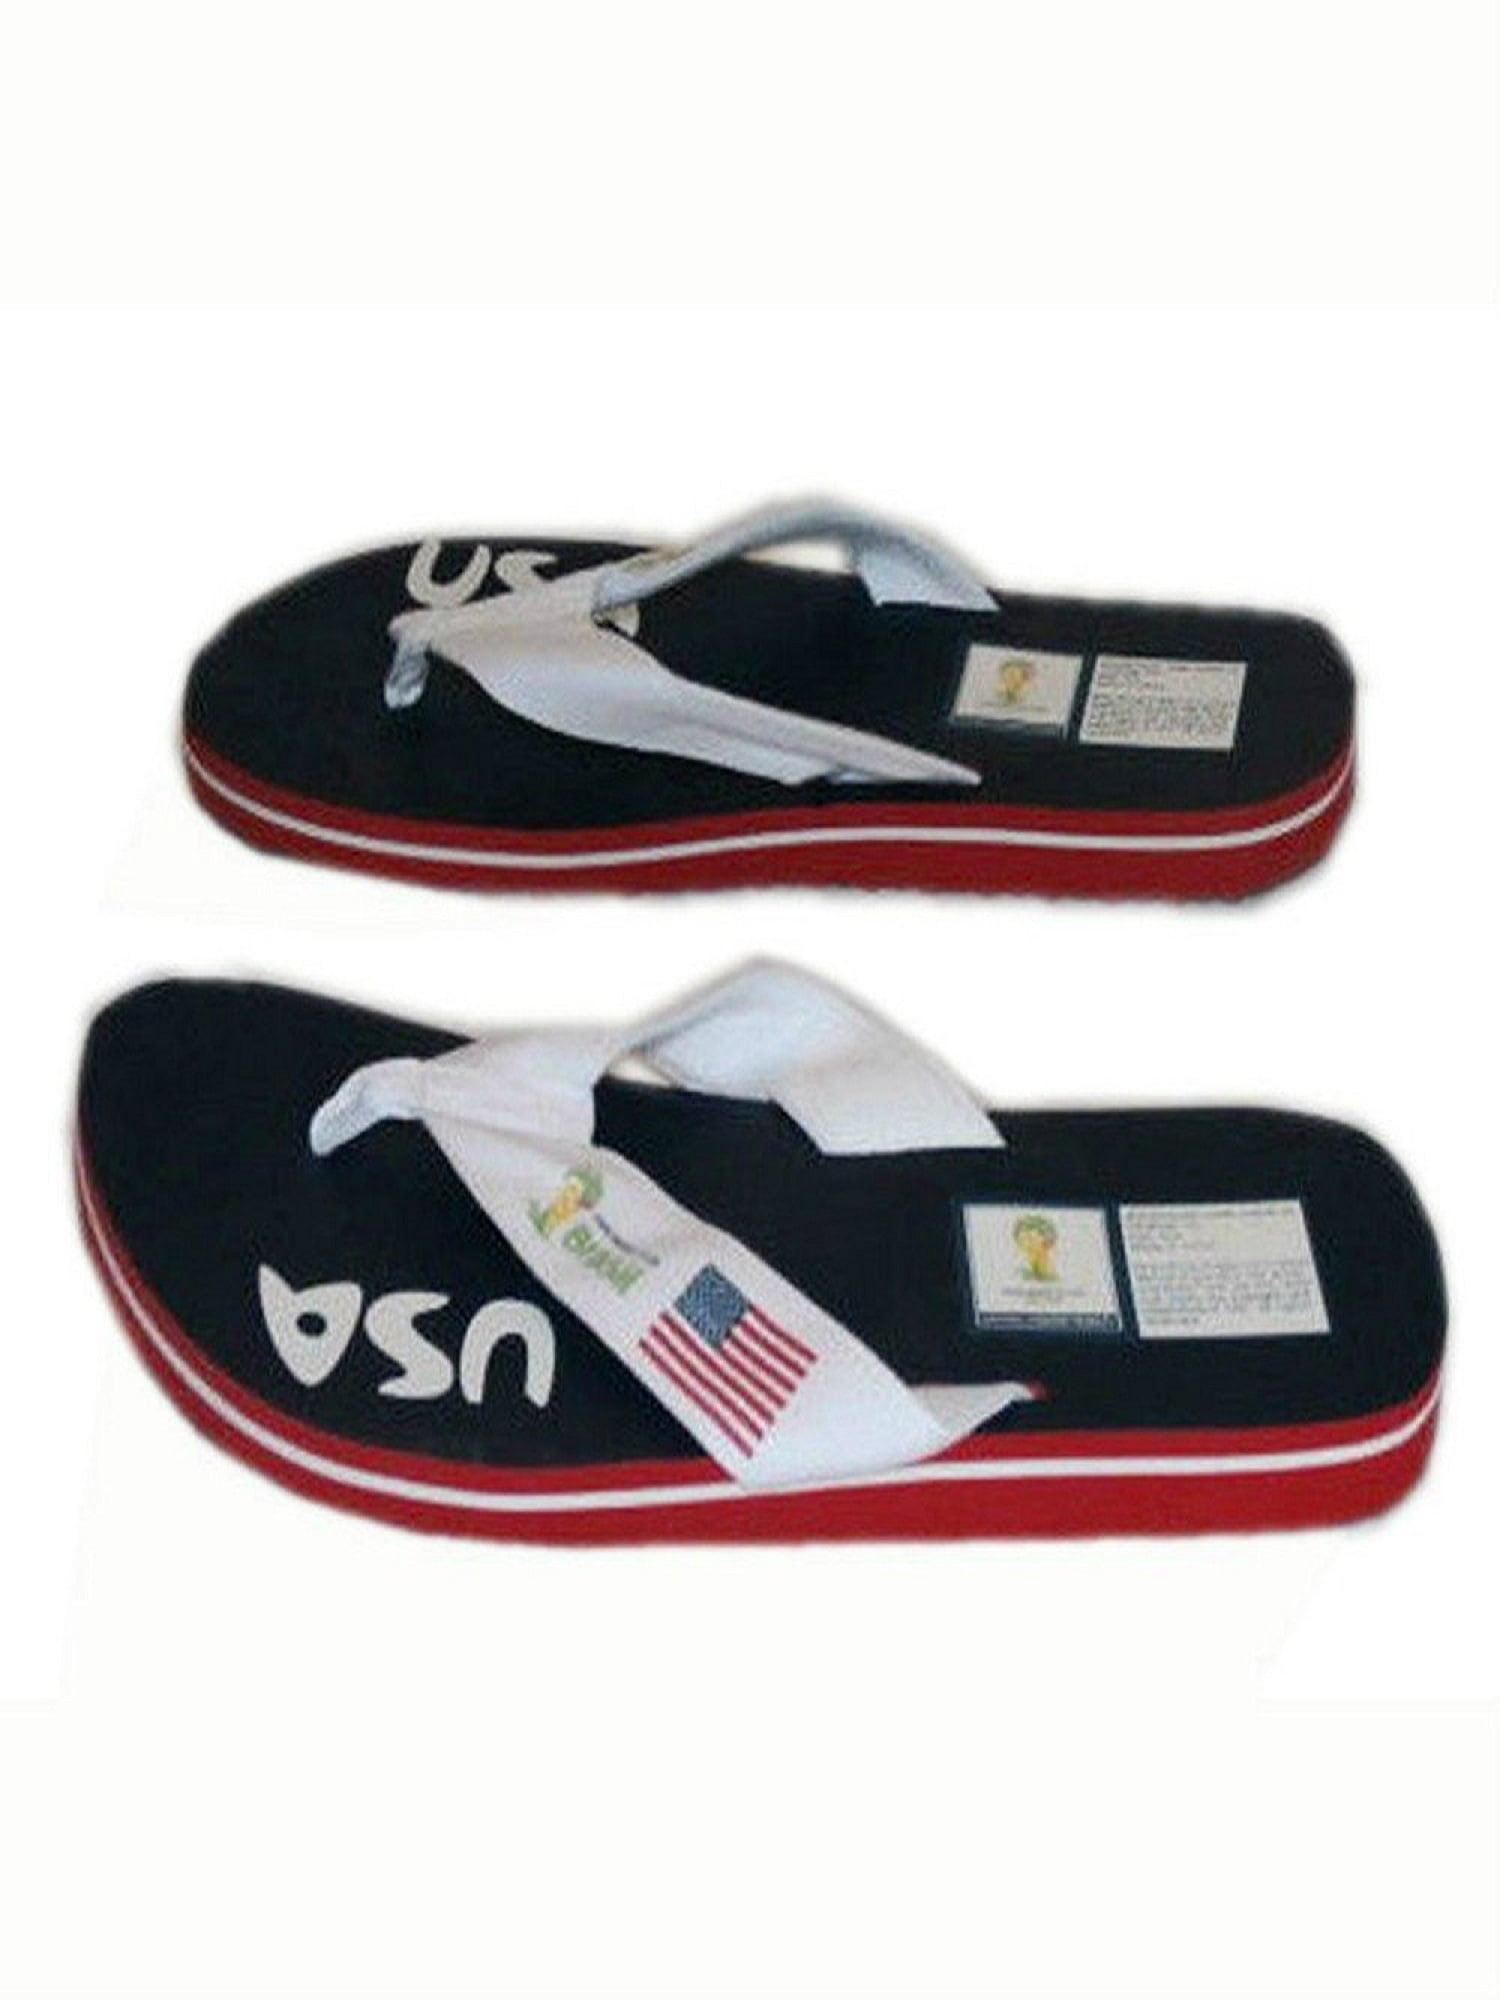 7e823049f1d5 Fanshoes - Adult FIFA World Cup Brasil Brazil USA Men s Thick Strap Flip  Flop Thong Sandals (6) - Walmart.com